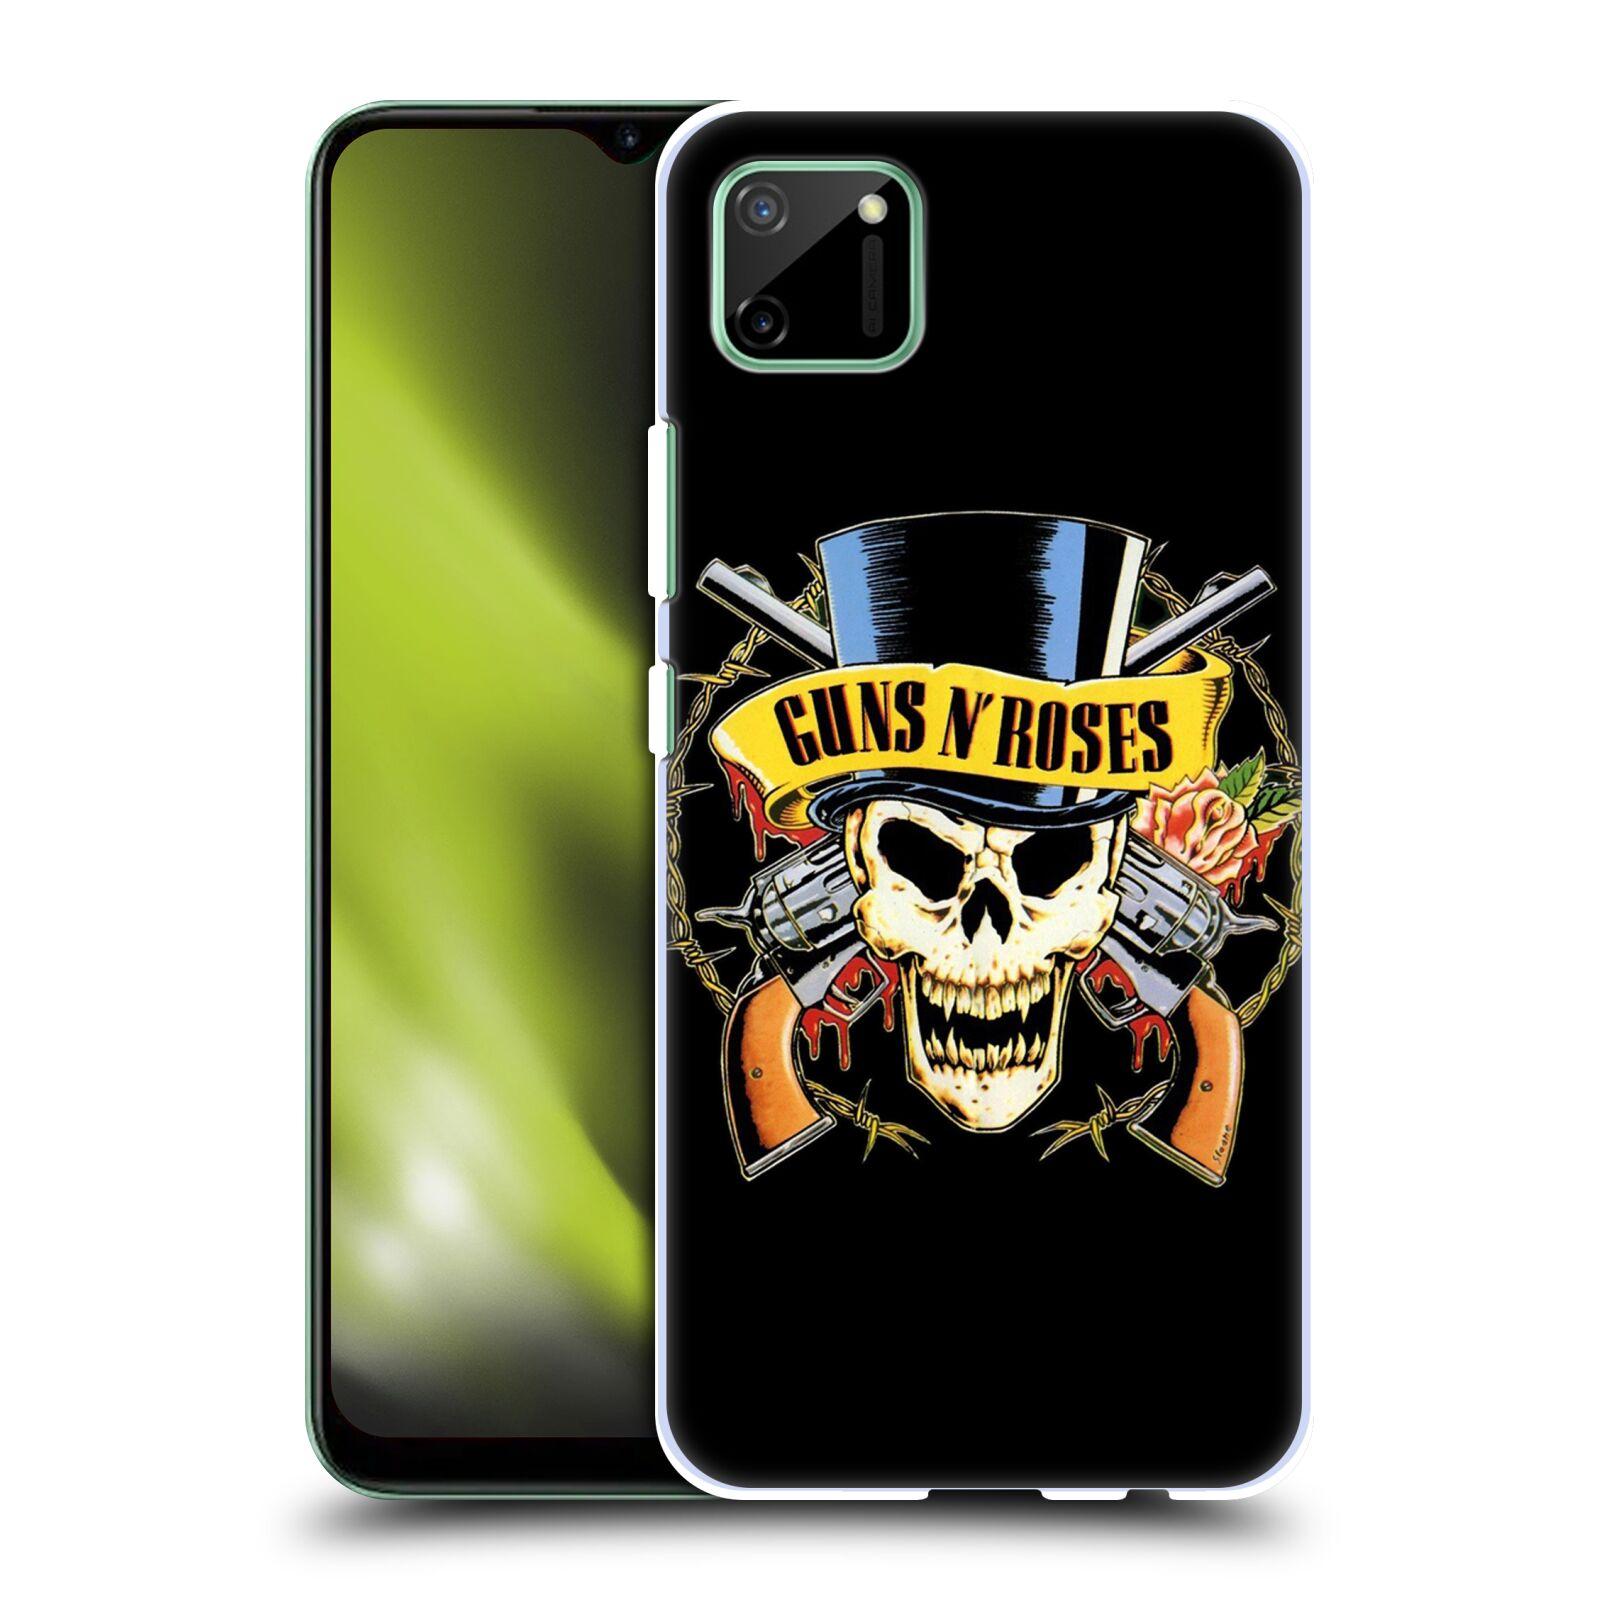 Plastové pouzdro na mobil Realme C11 - Head Case - Guns N' Roses - Lebka